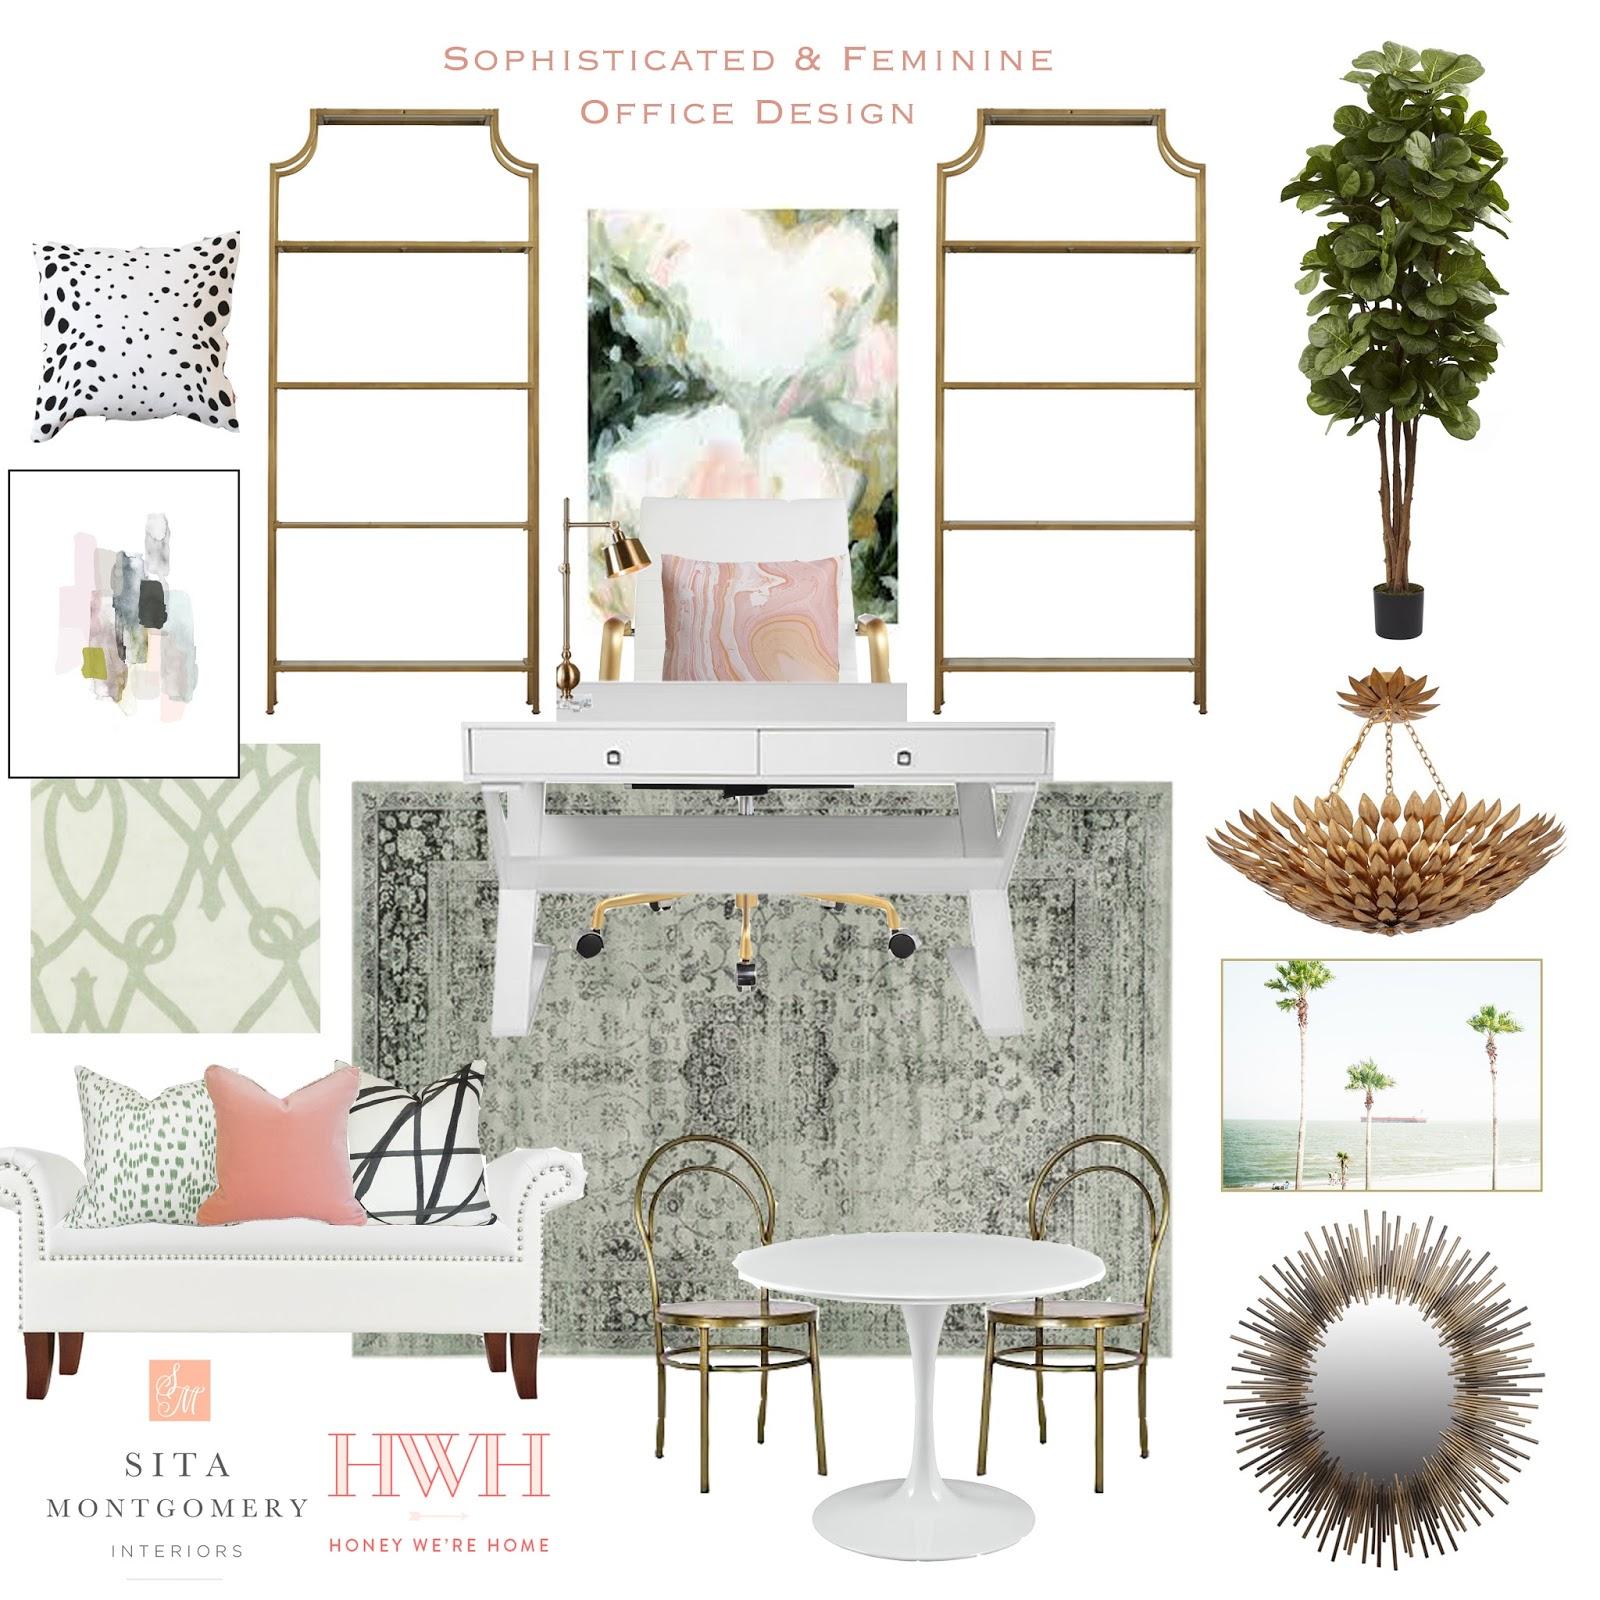 21 Feminine Home Office Designs Decorating Ideas: Sophisticated & Feminine